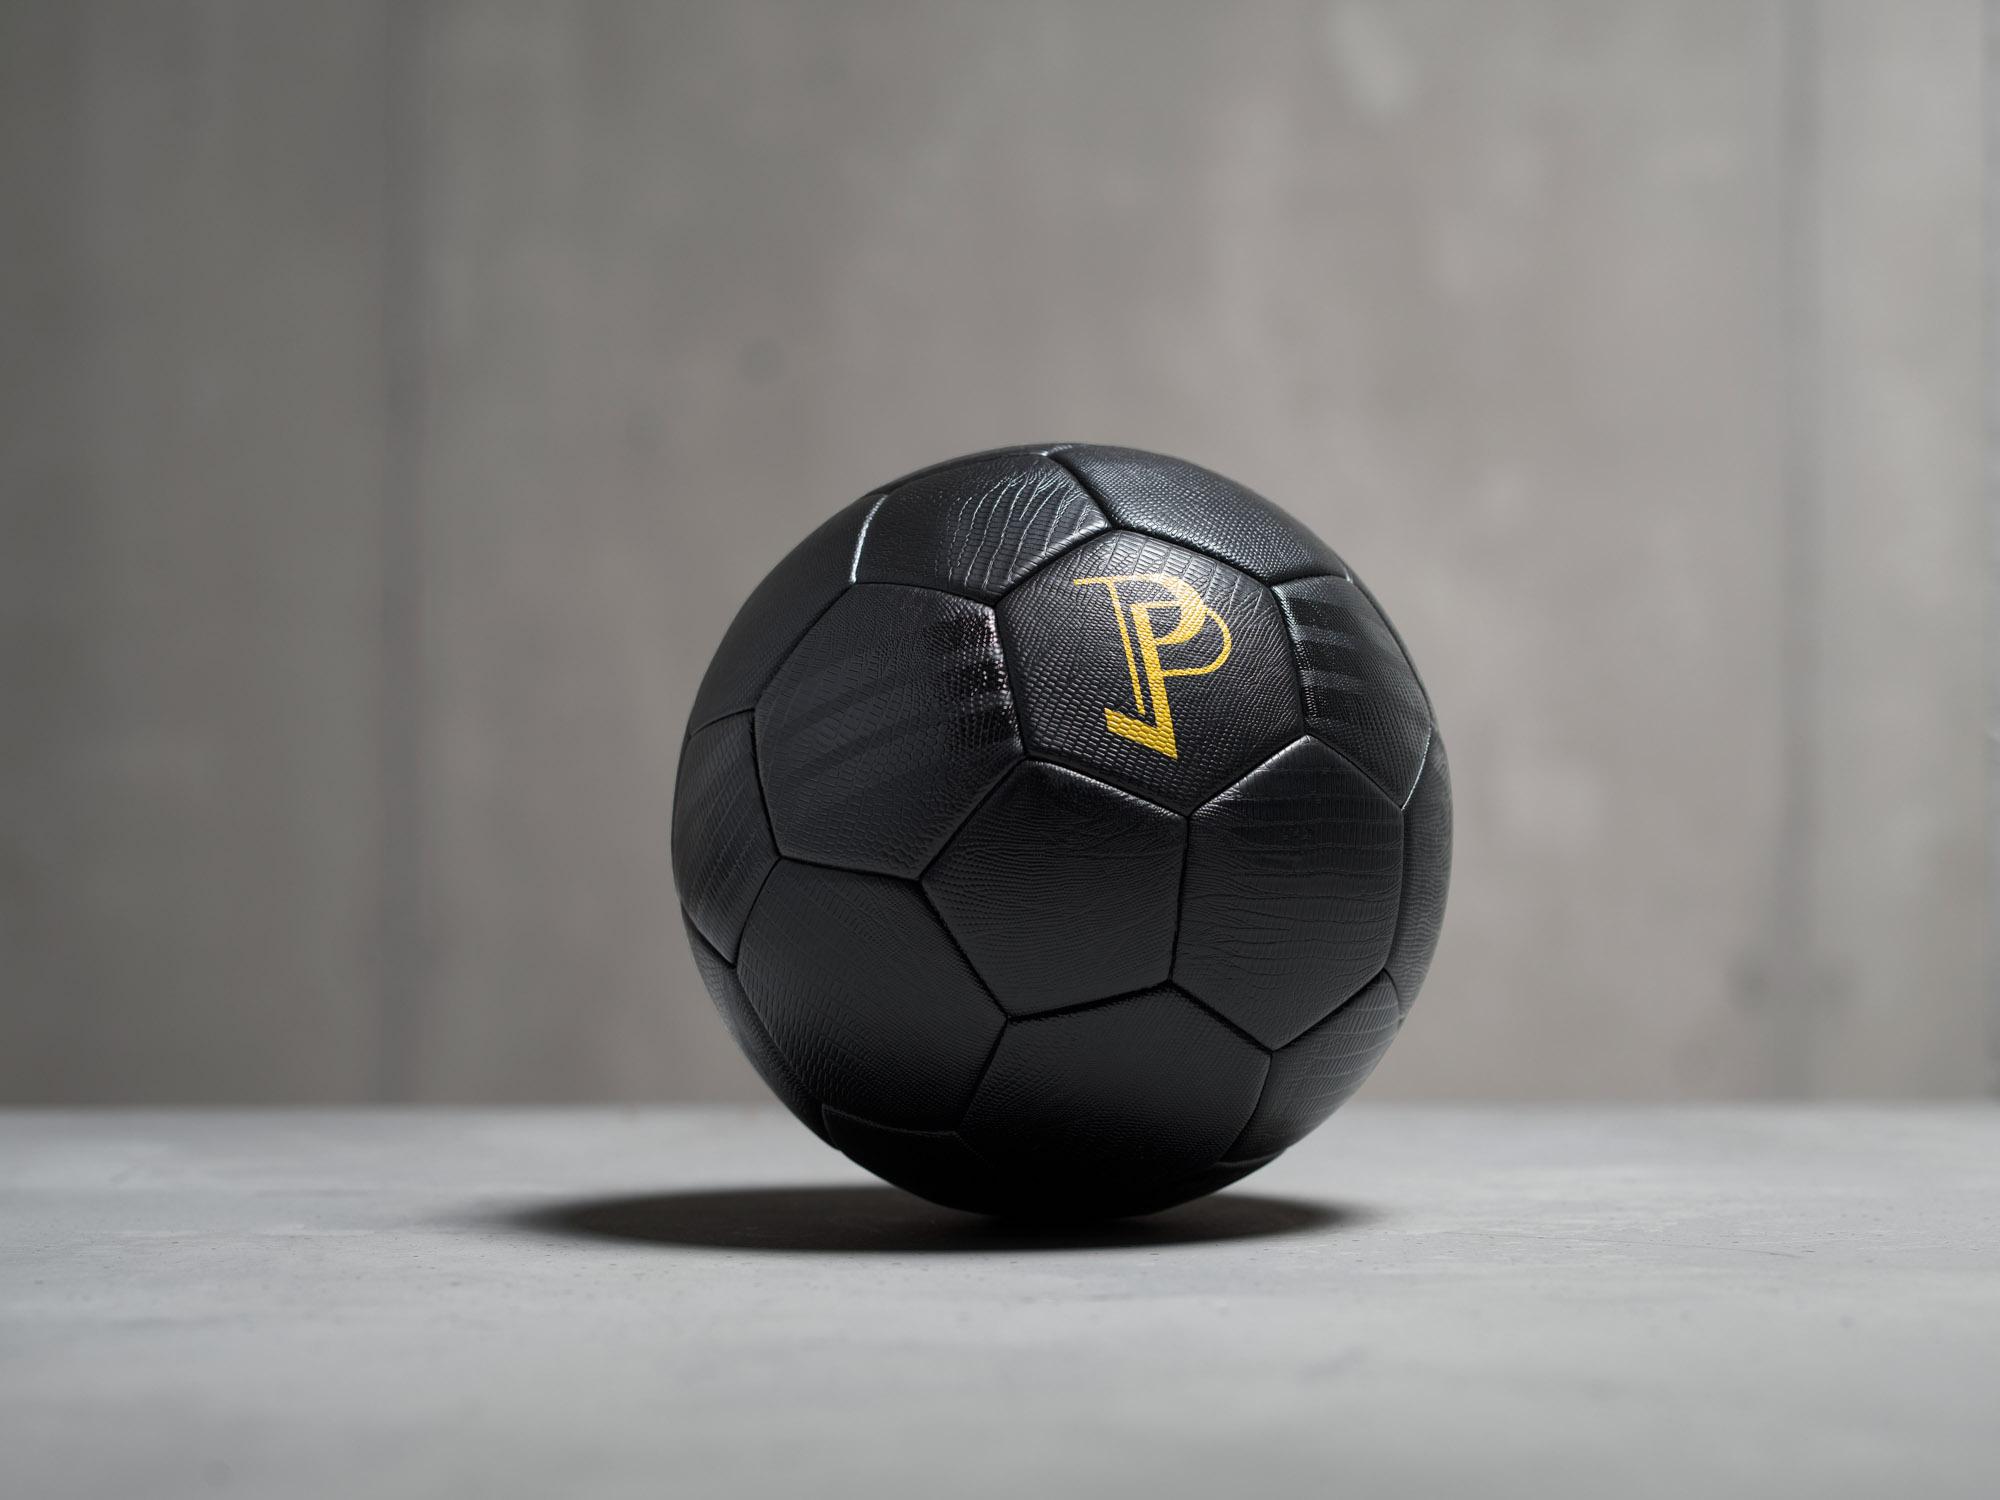 Paul Pogba x adidas 16